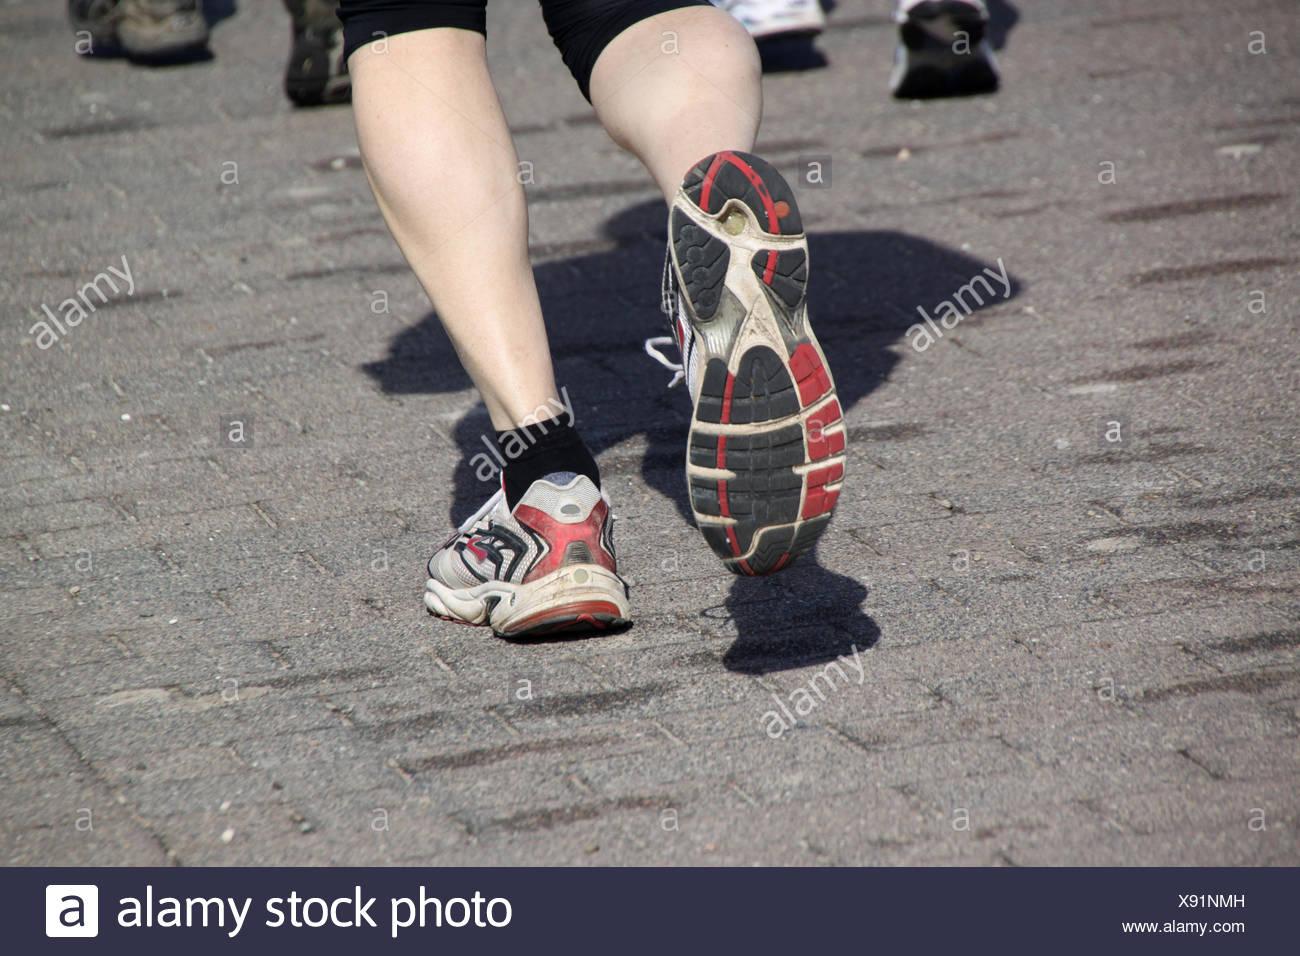 athletic sports - Stock Image